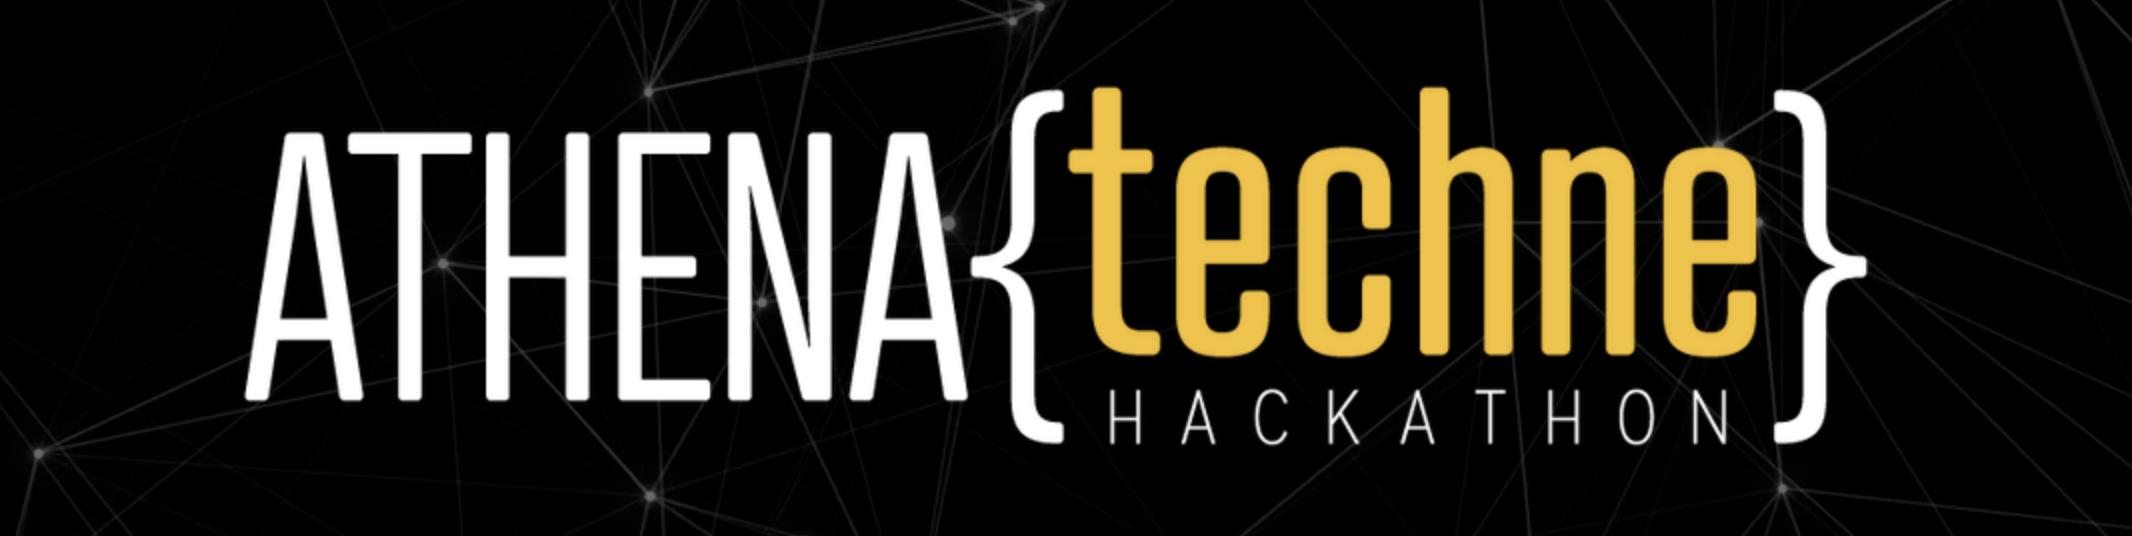 athena_techne_hackathon